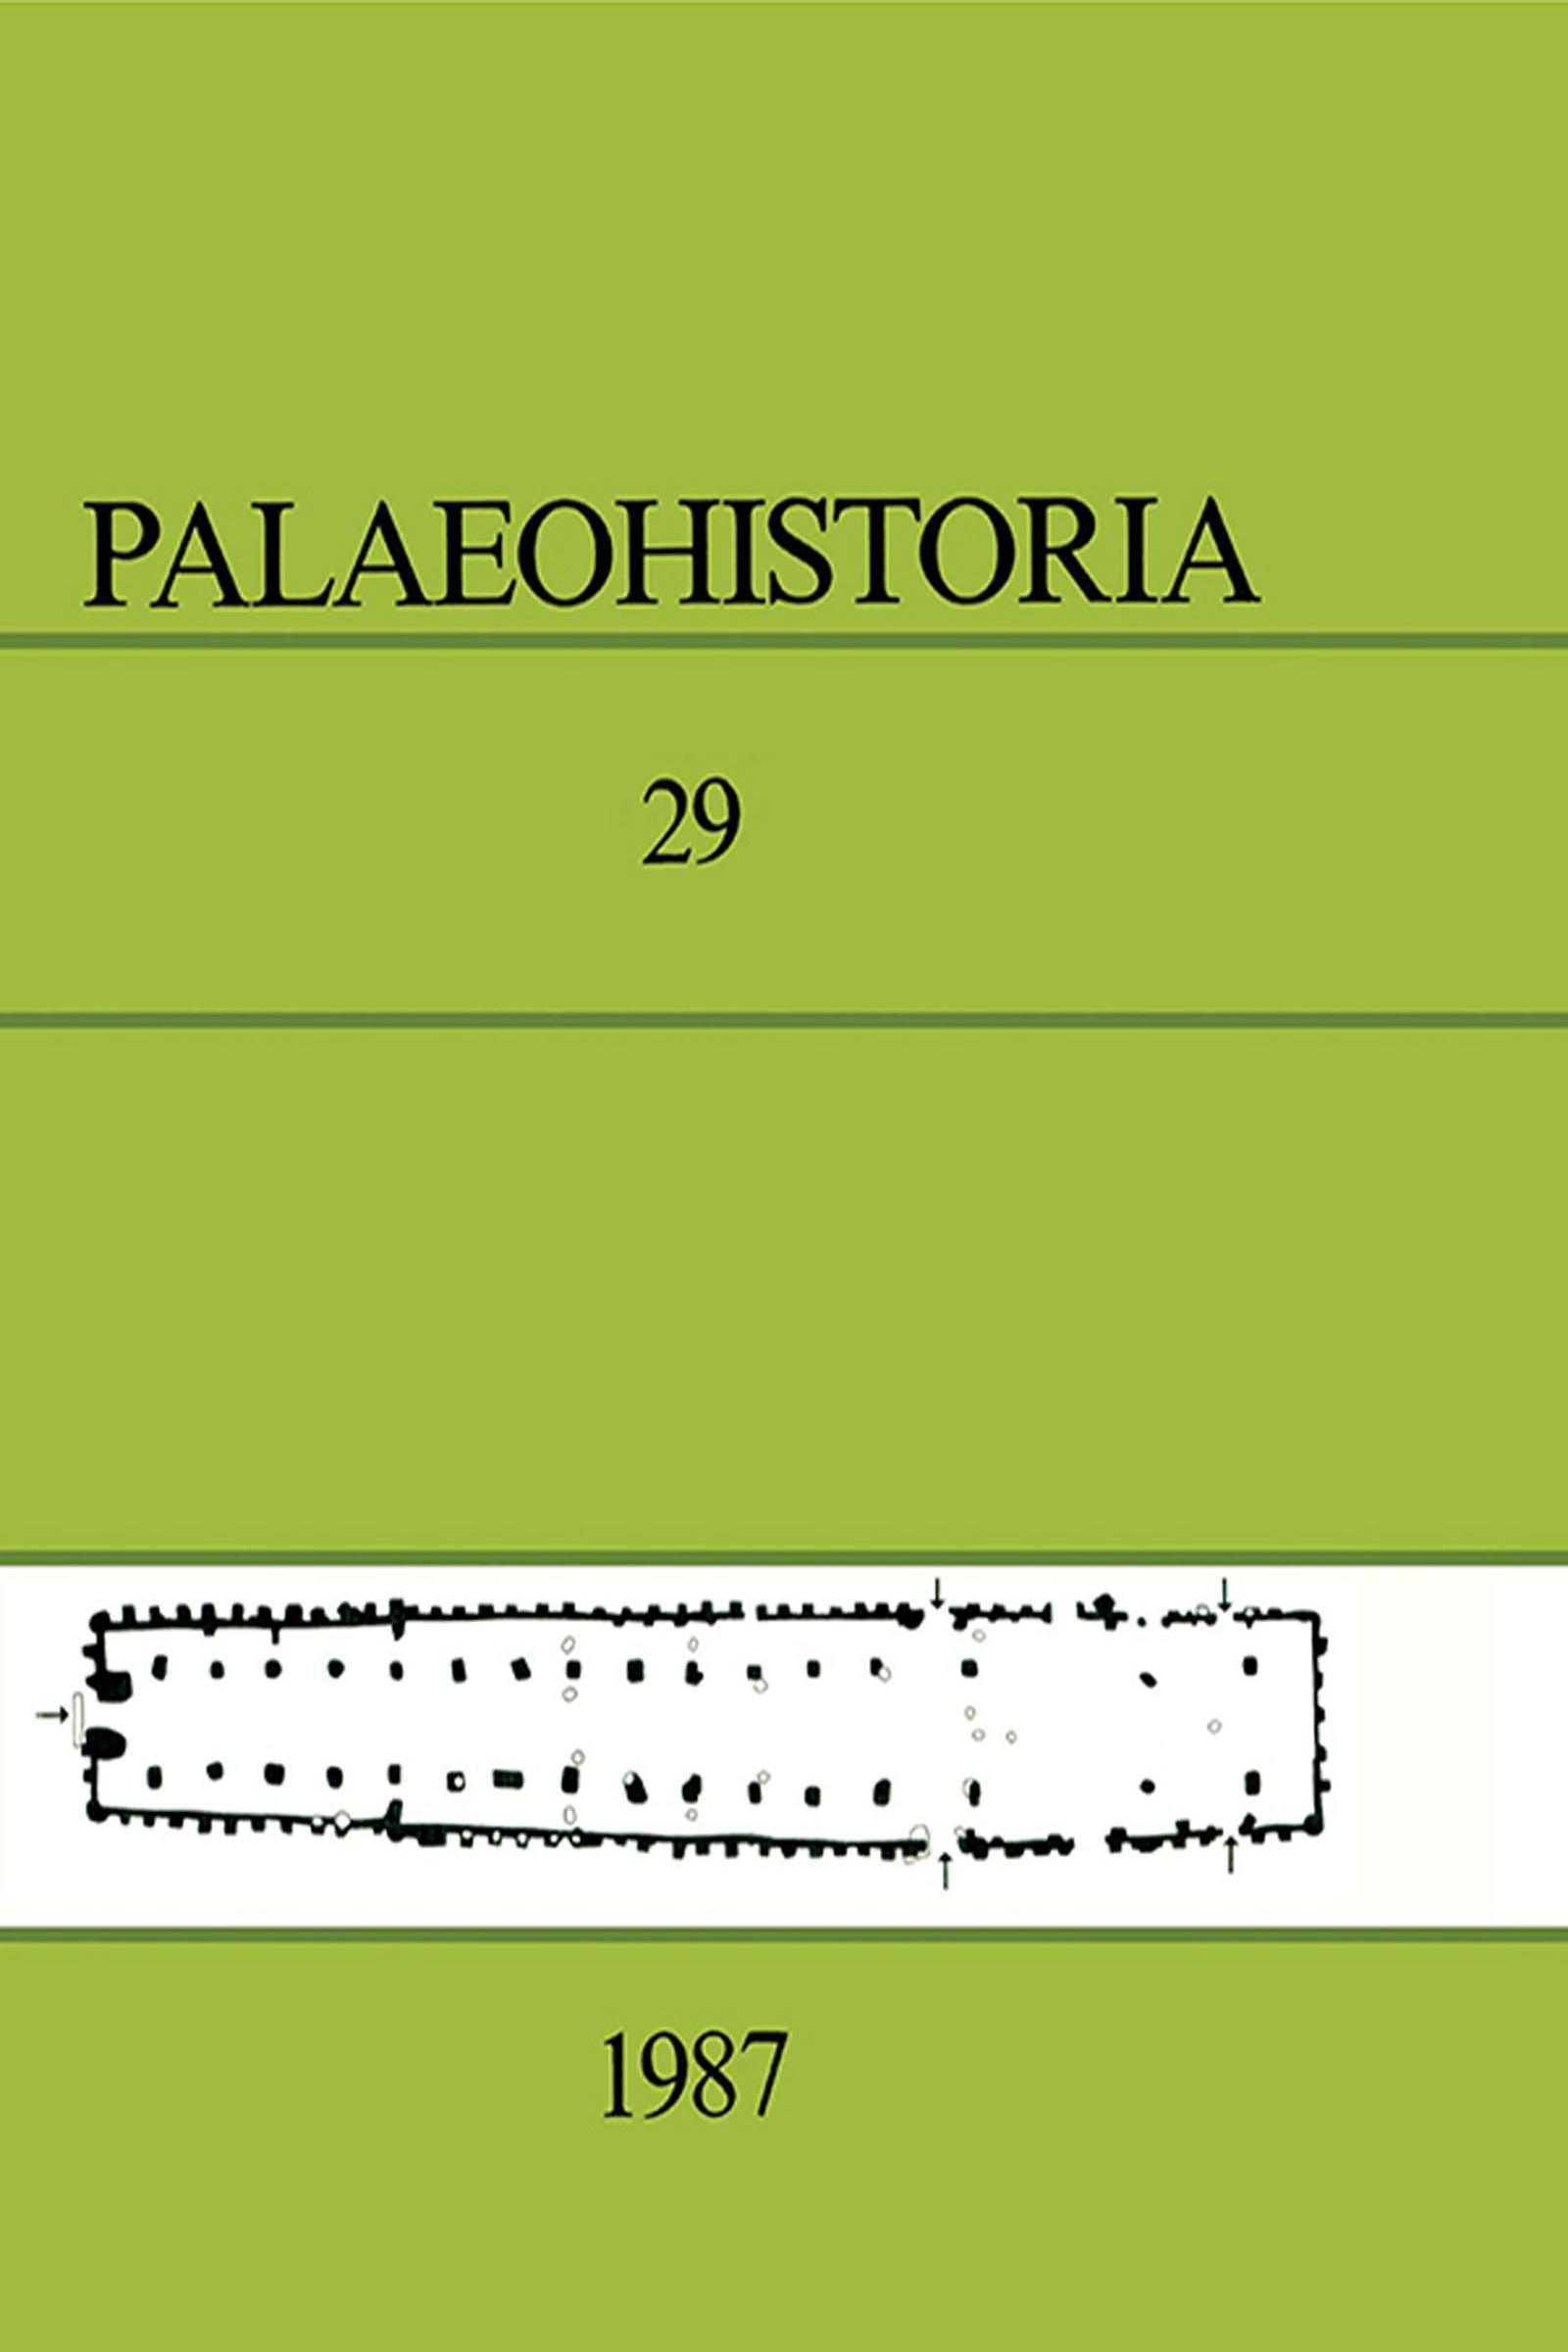 Palaeohistoria